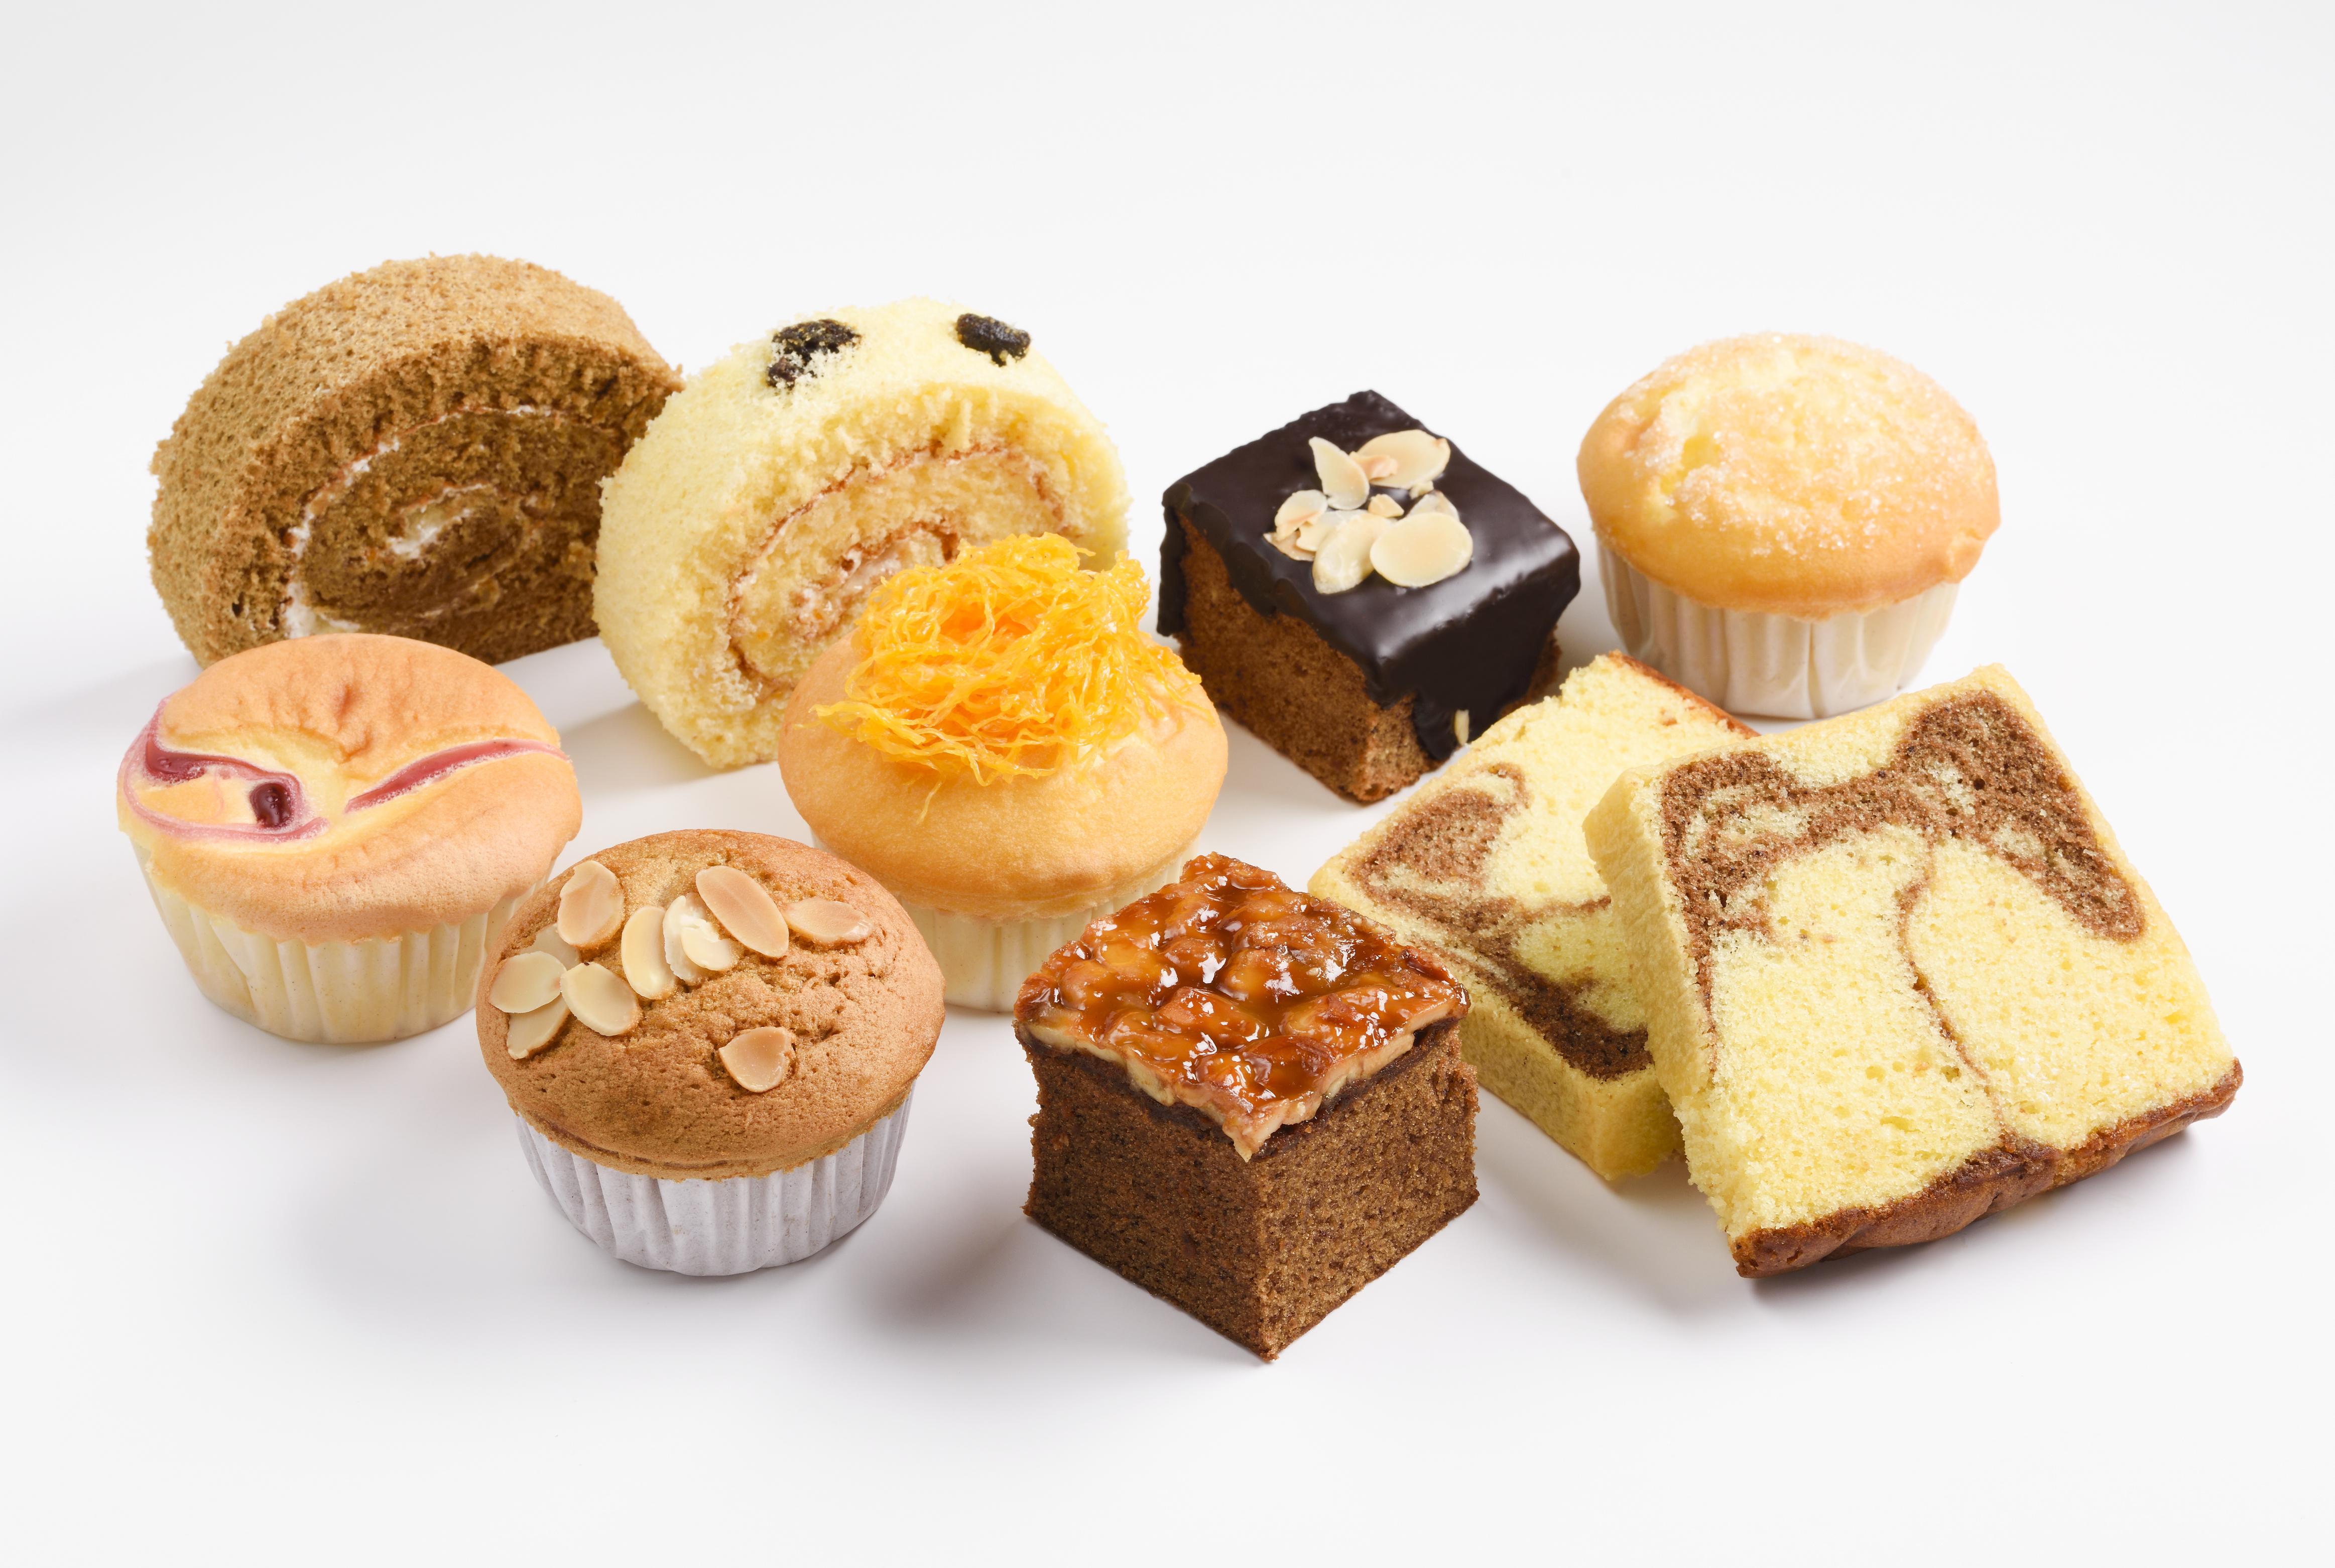 mix cake-snackbox-สแน็คบ๊อกซ์-จัดเลี้ยง-catering-สัมมนา-ประชุม-ขนมปัง-ขนมเบรค-อาหารว่าง-เค้กไข่ไต้หวัน-lunchbox-CoffeeBreak-foodstallmenu